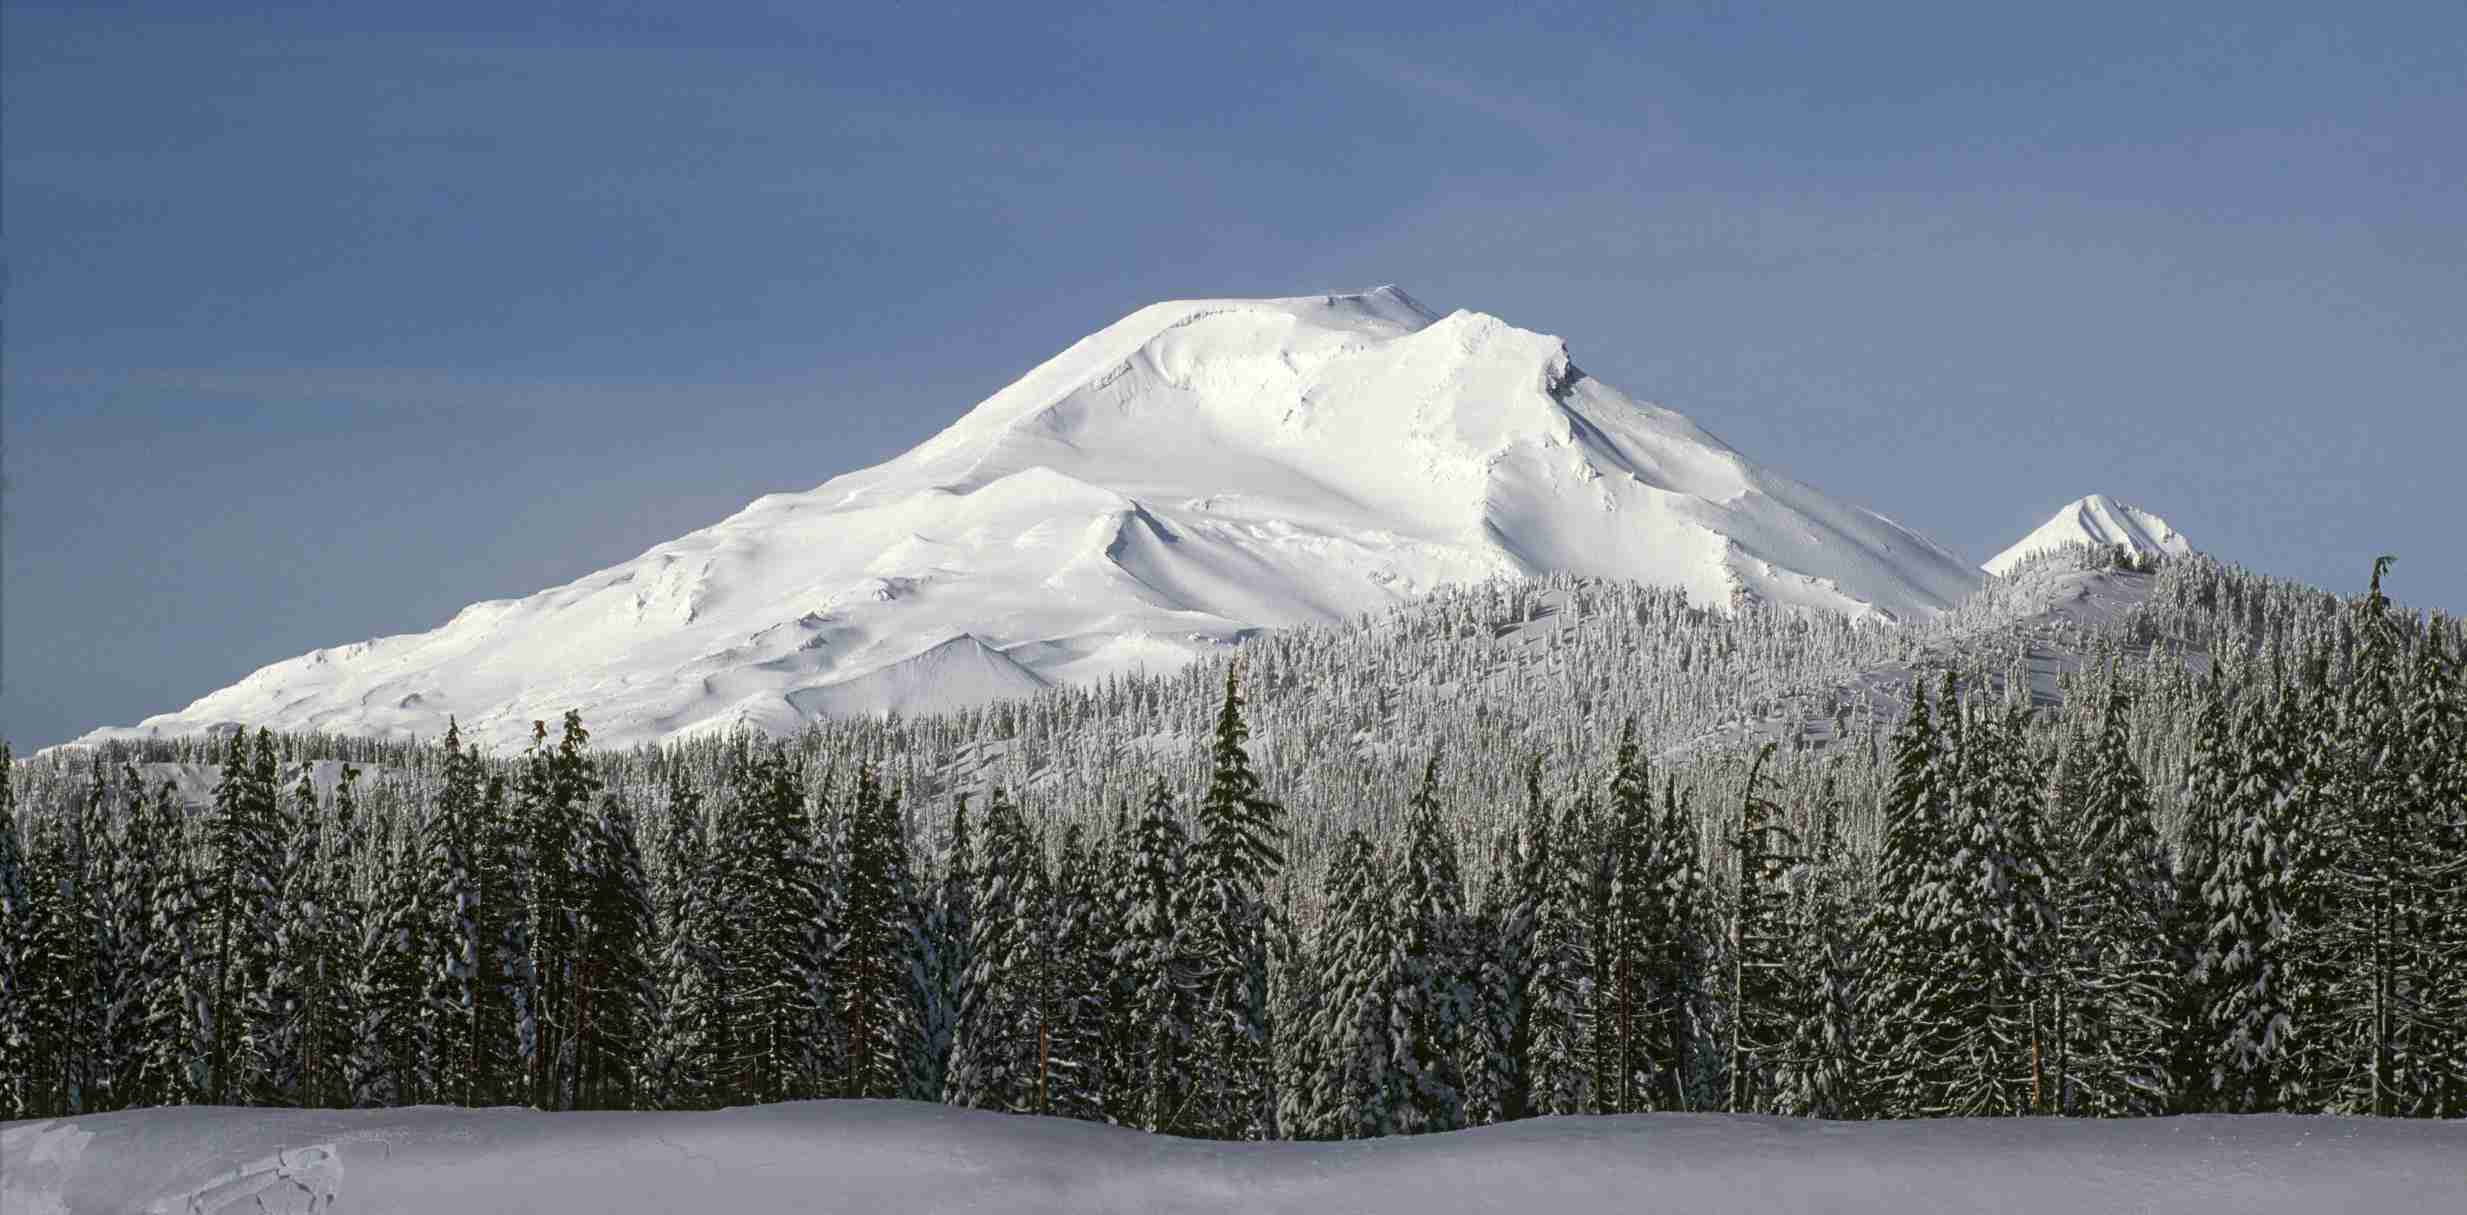 Peaks of the Oregon Cascades